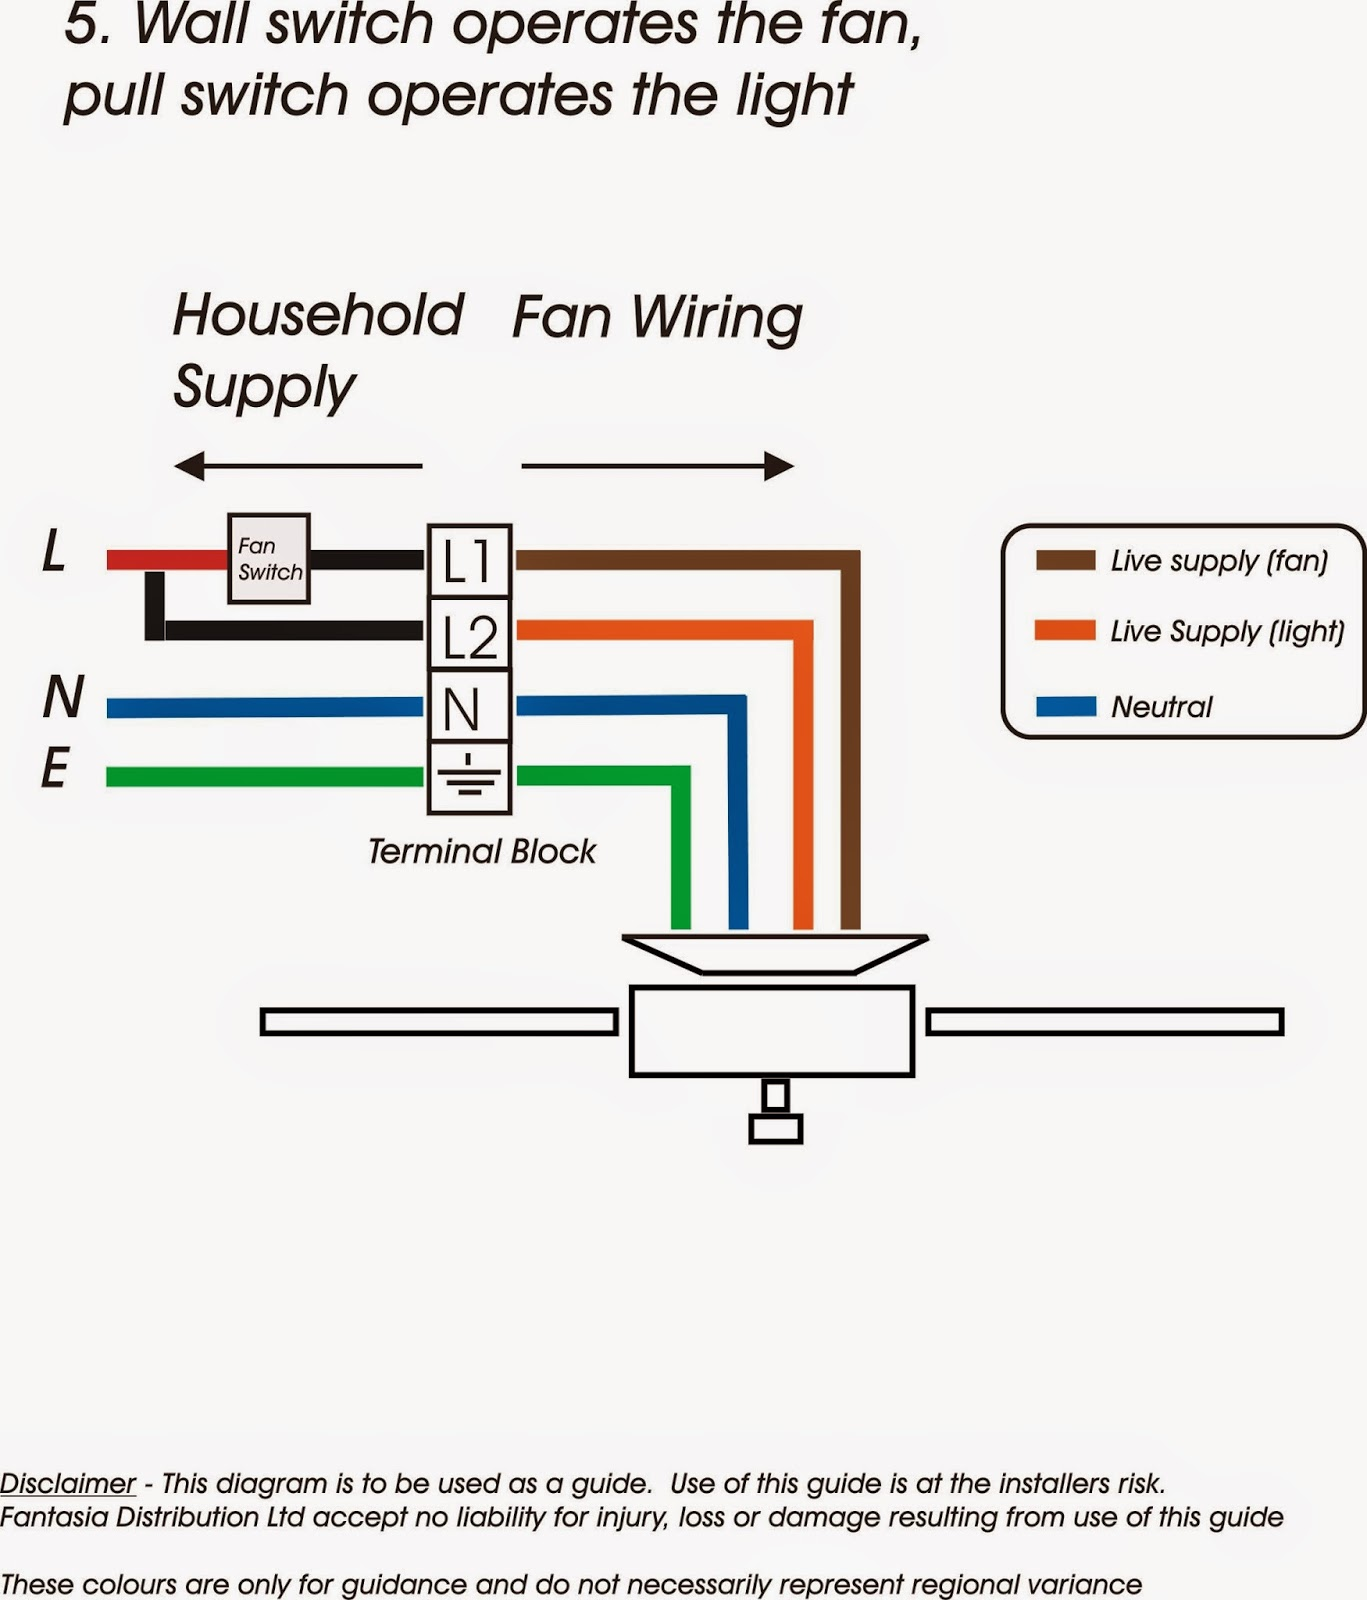 electric work wiring diagramtable fan wiring diagram 21 [ 1367 x 1600 Pixel ]